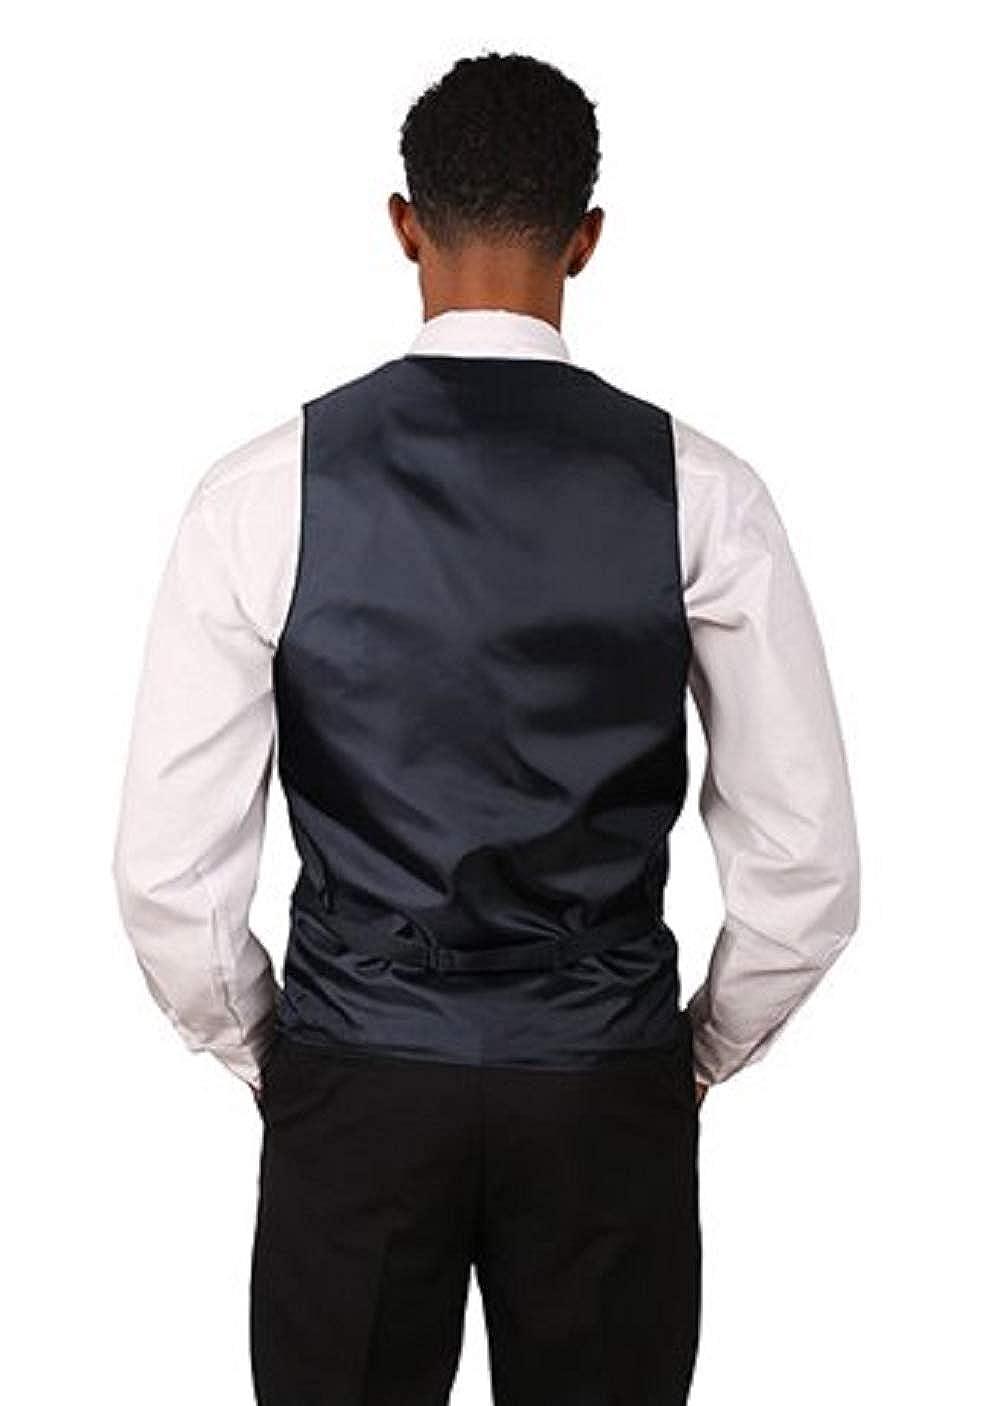 13 Color Variations Mens Formal Designer Business Suit Paisley Pattern Jacquard Vest and Black Bow Tie Set